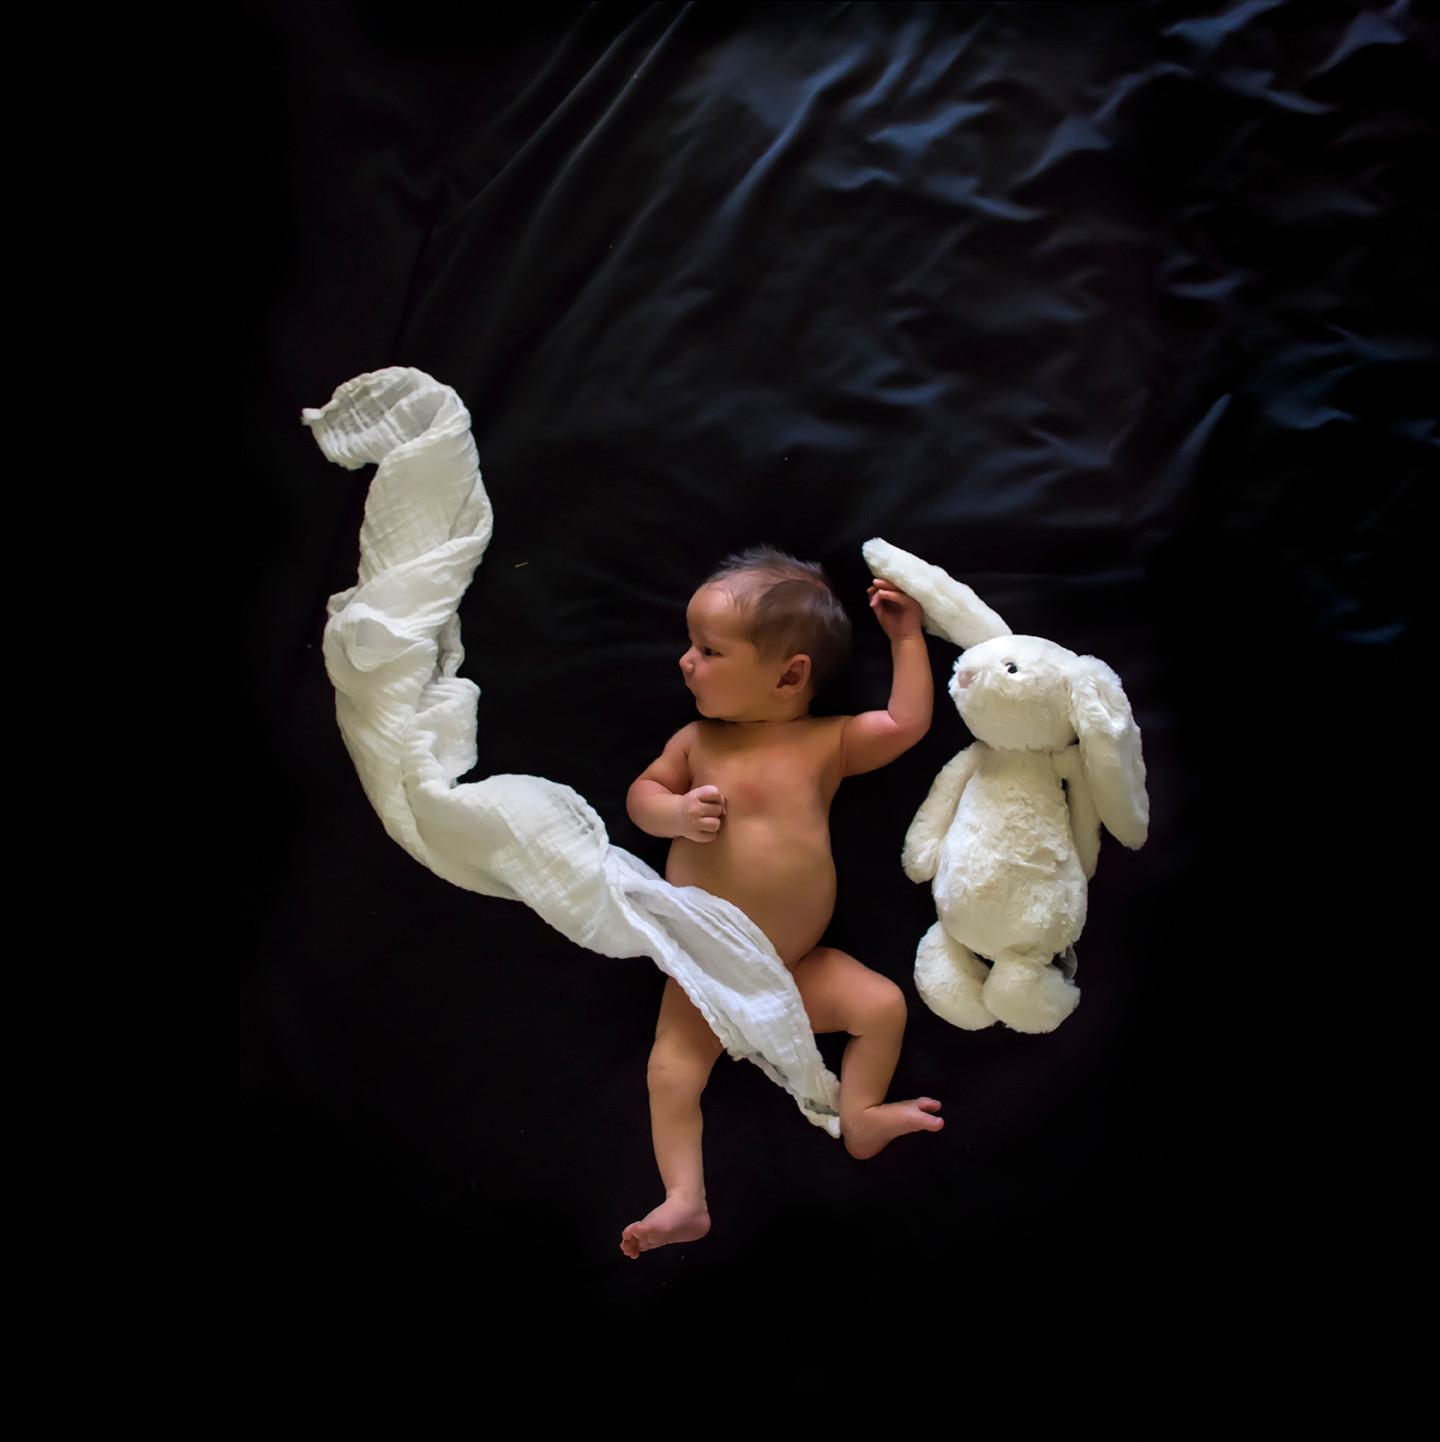 Baby Photography | Photo Art